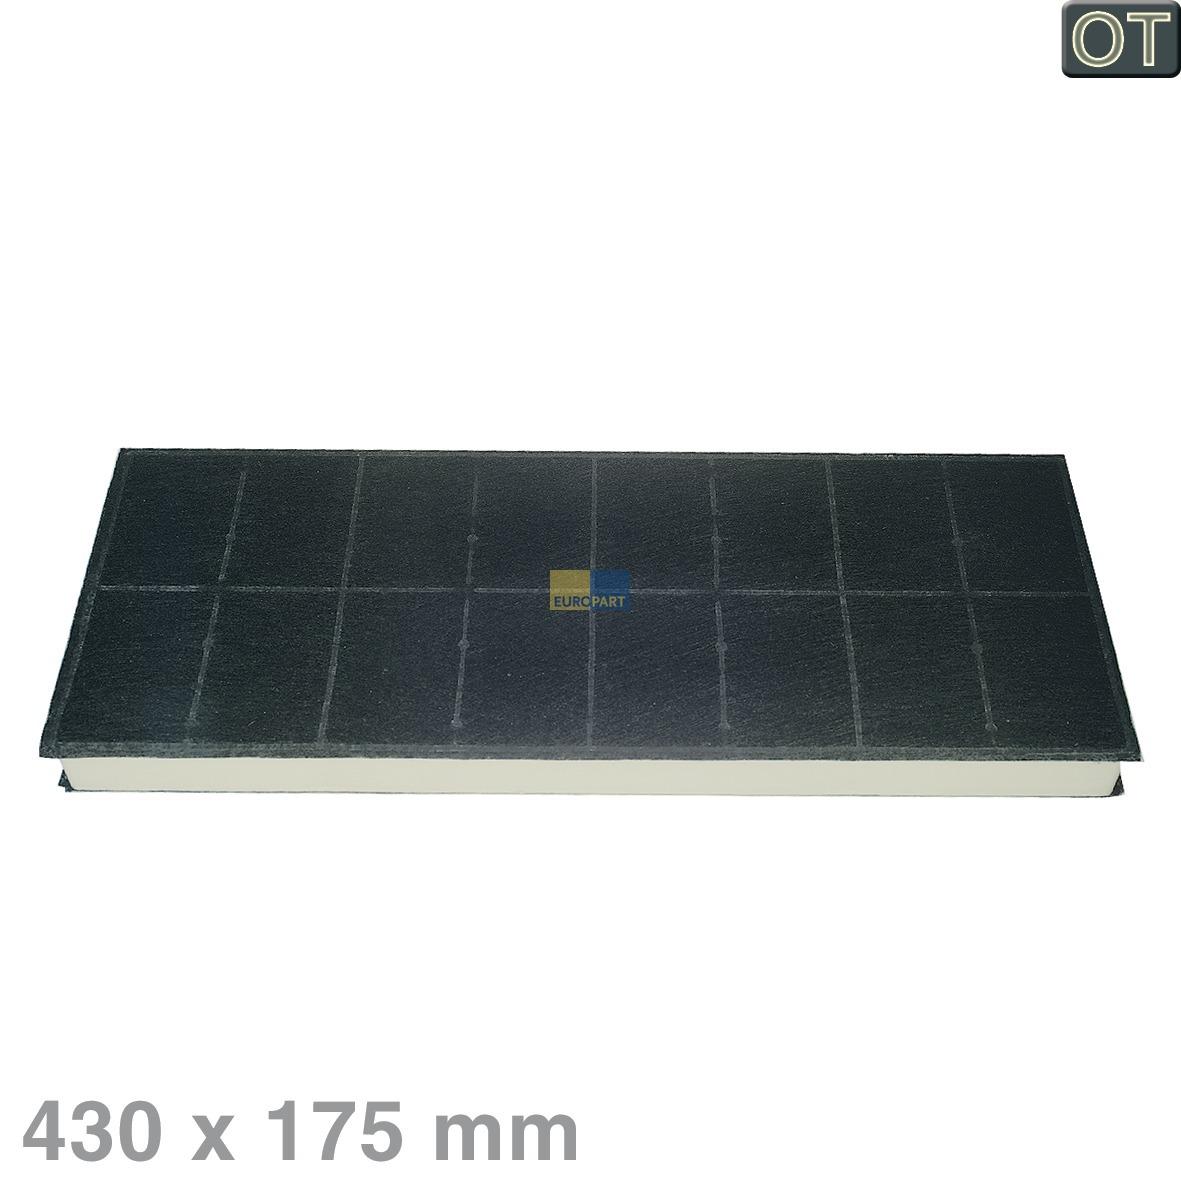 Kohlefilter 430x175mm Neff 00296178 Original Abea Hausgerate